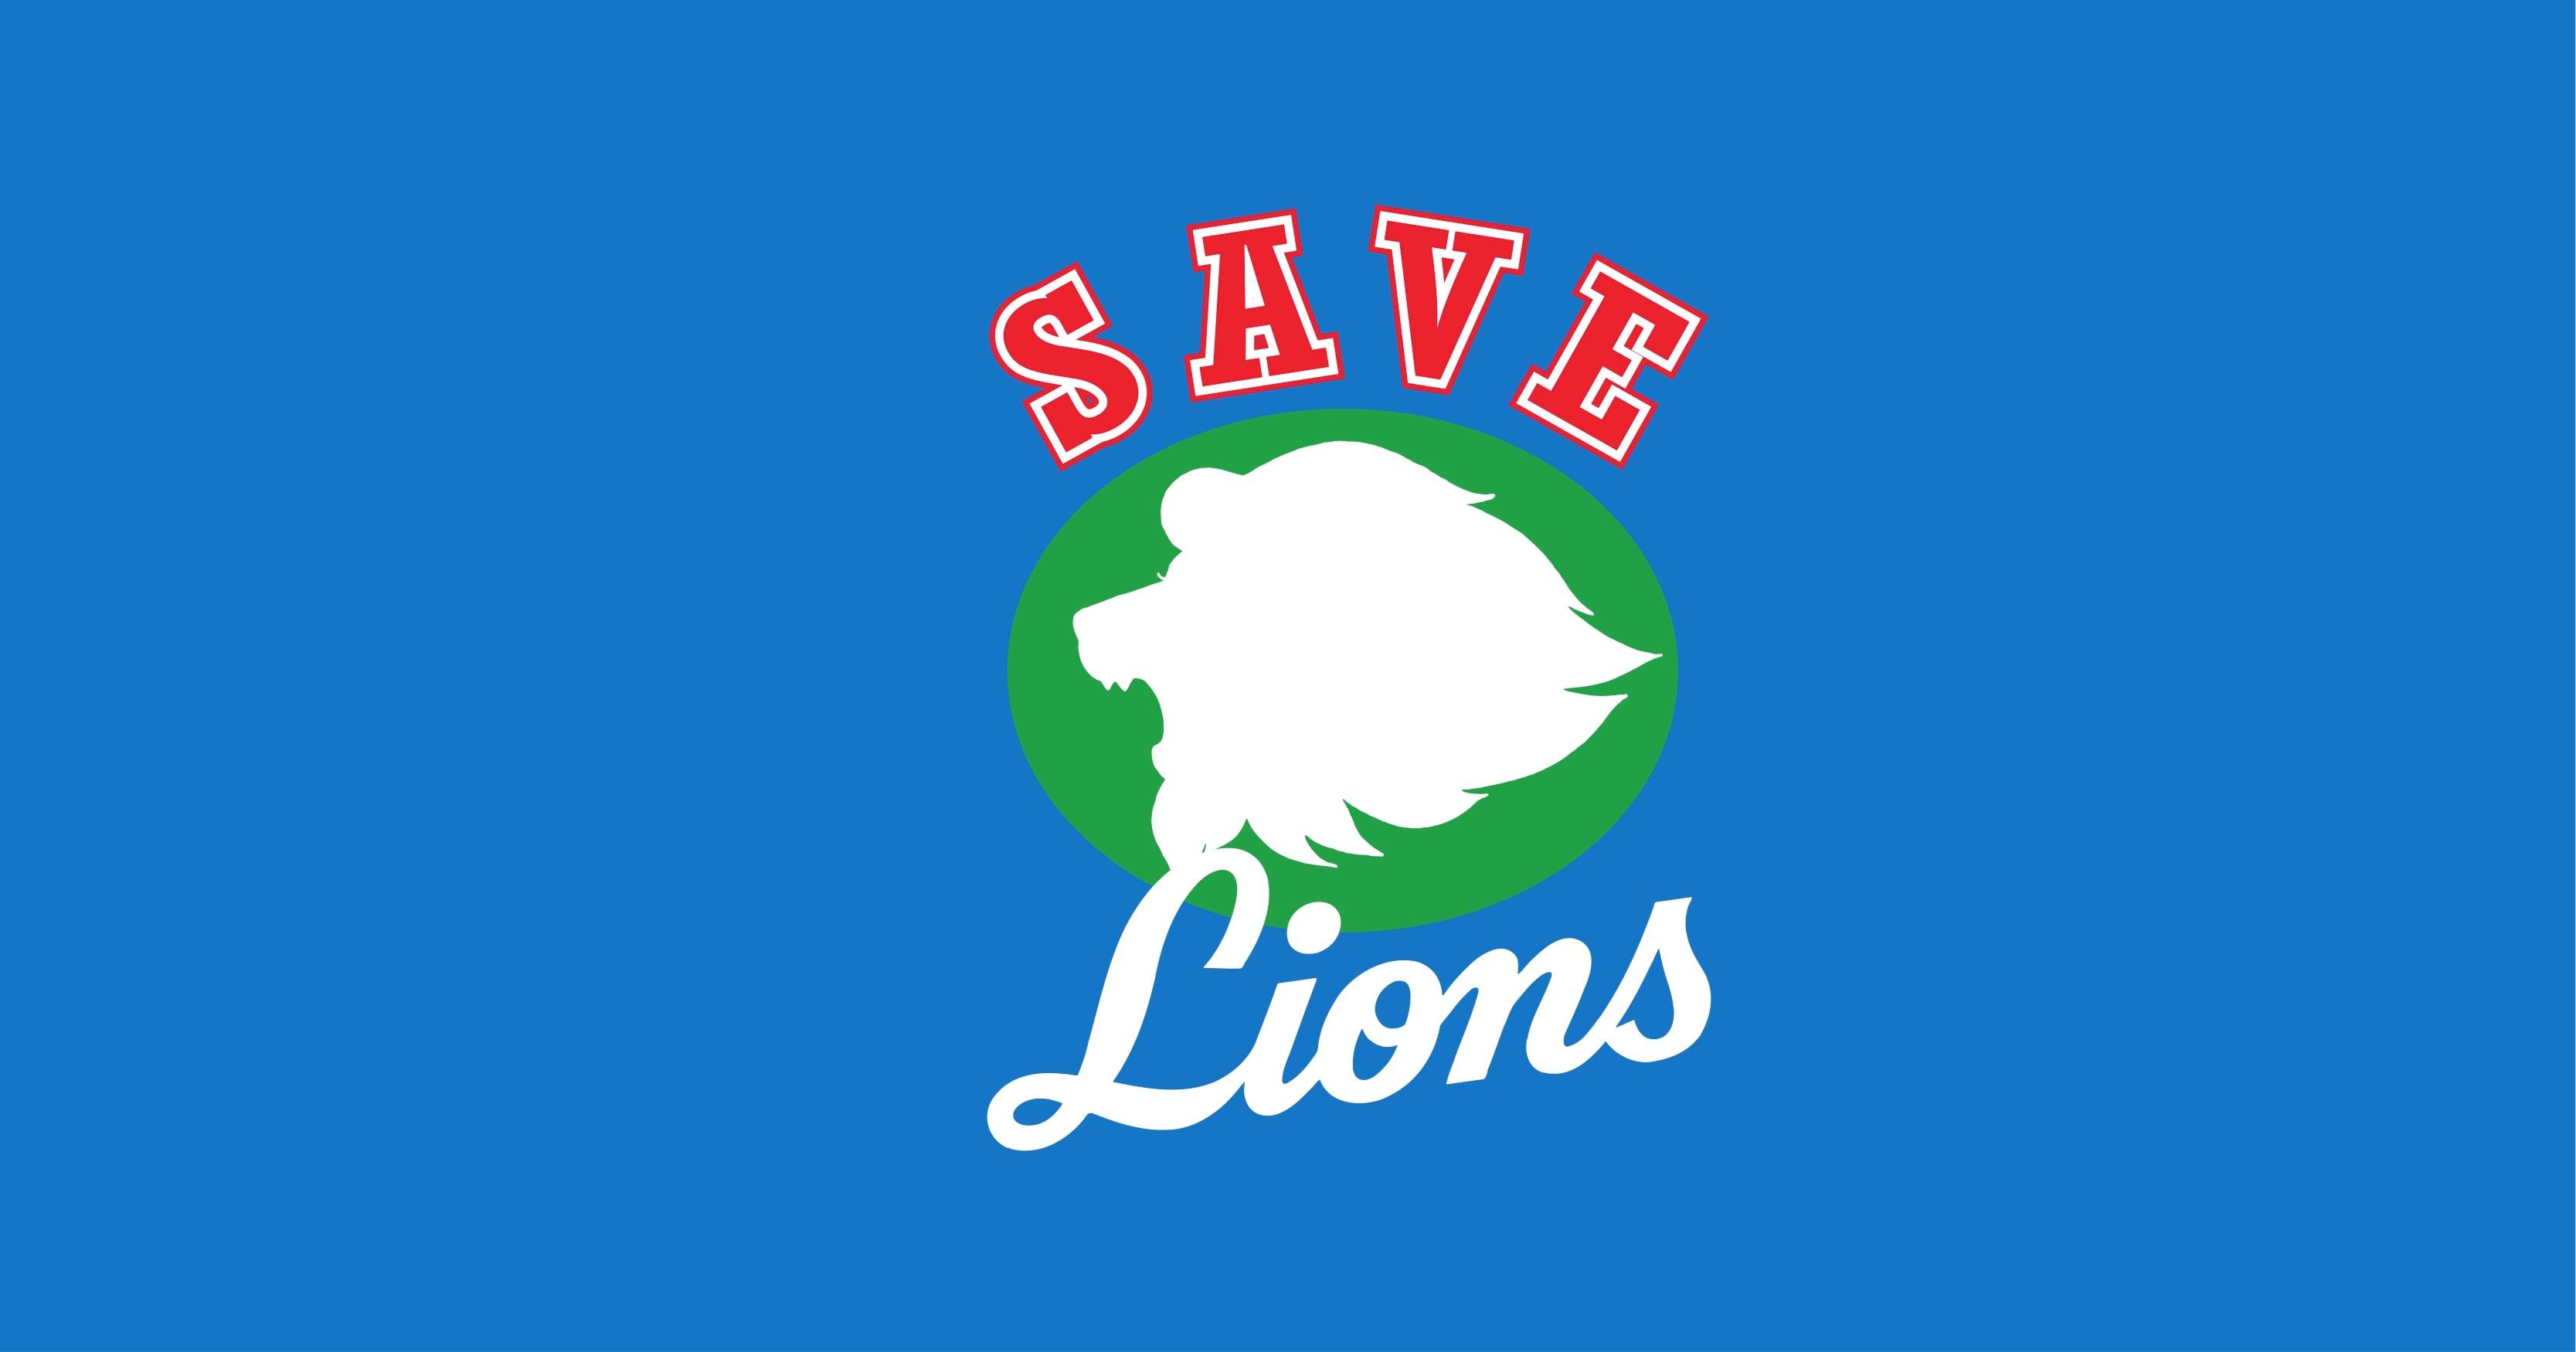 Save Lions logo